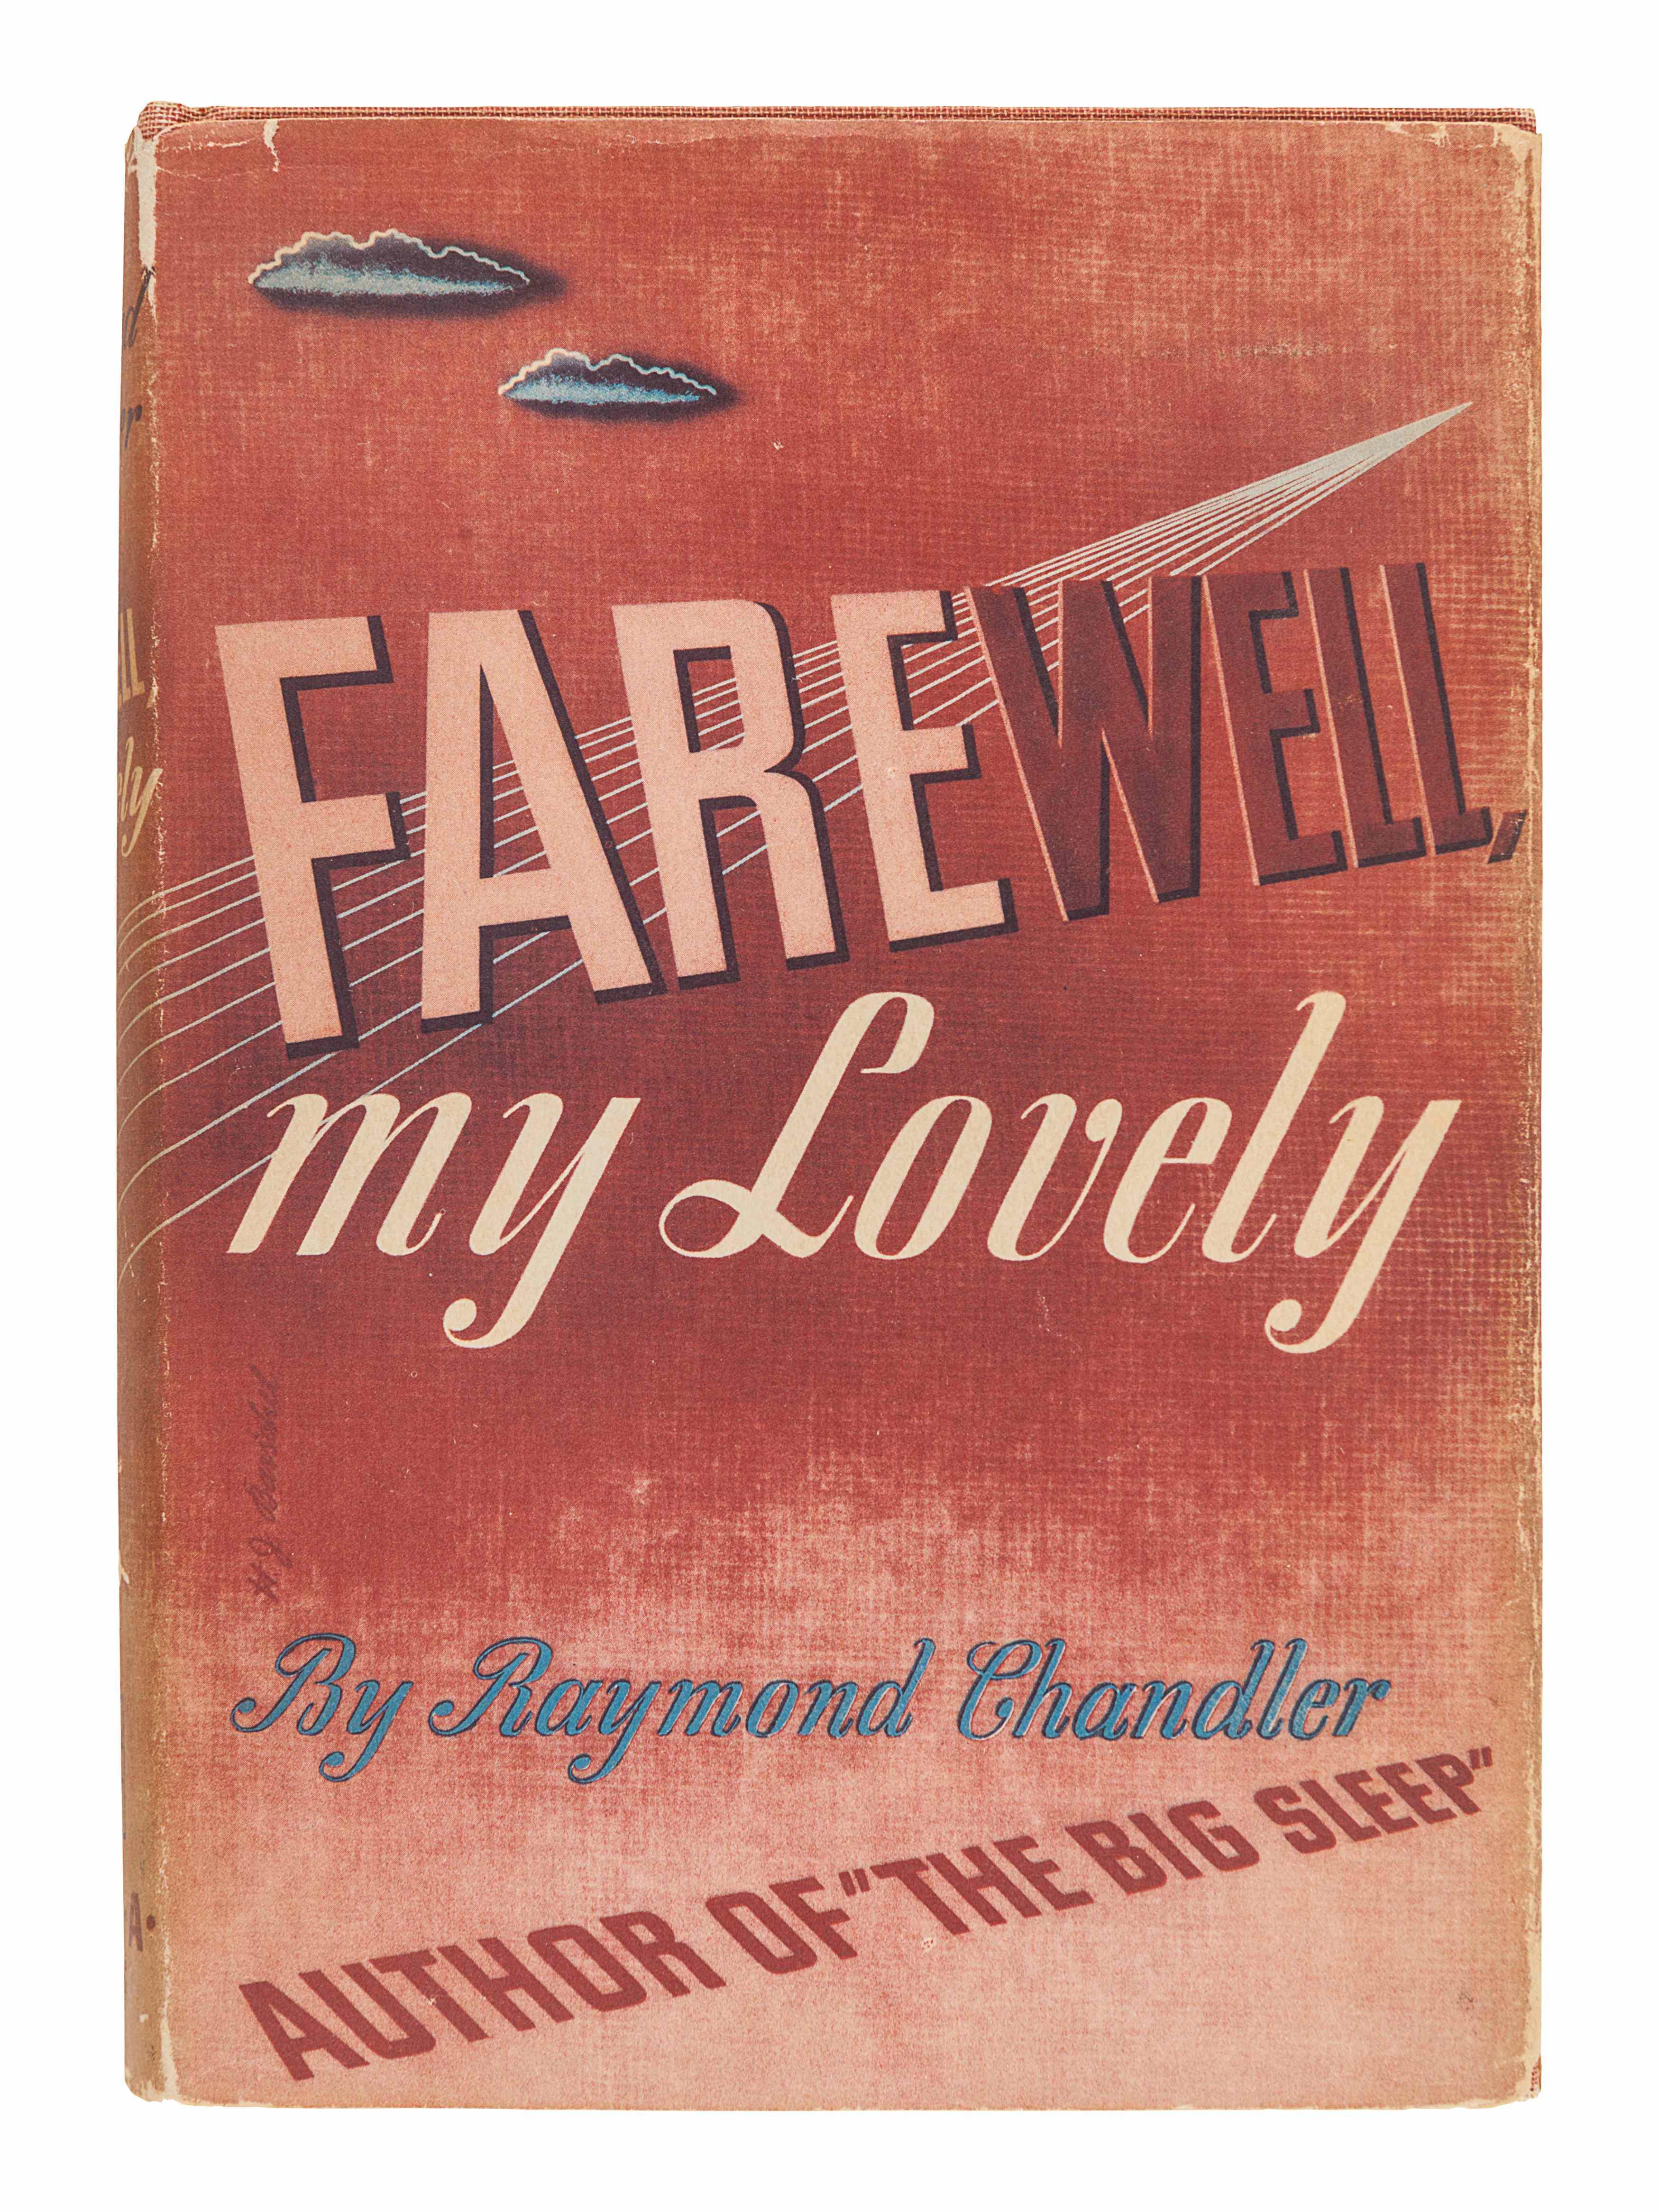 CHANDLER, Raymond (1888-1959). Farewell, My Lovely. New York: Alfred A. Knopf, 1940.